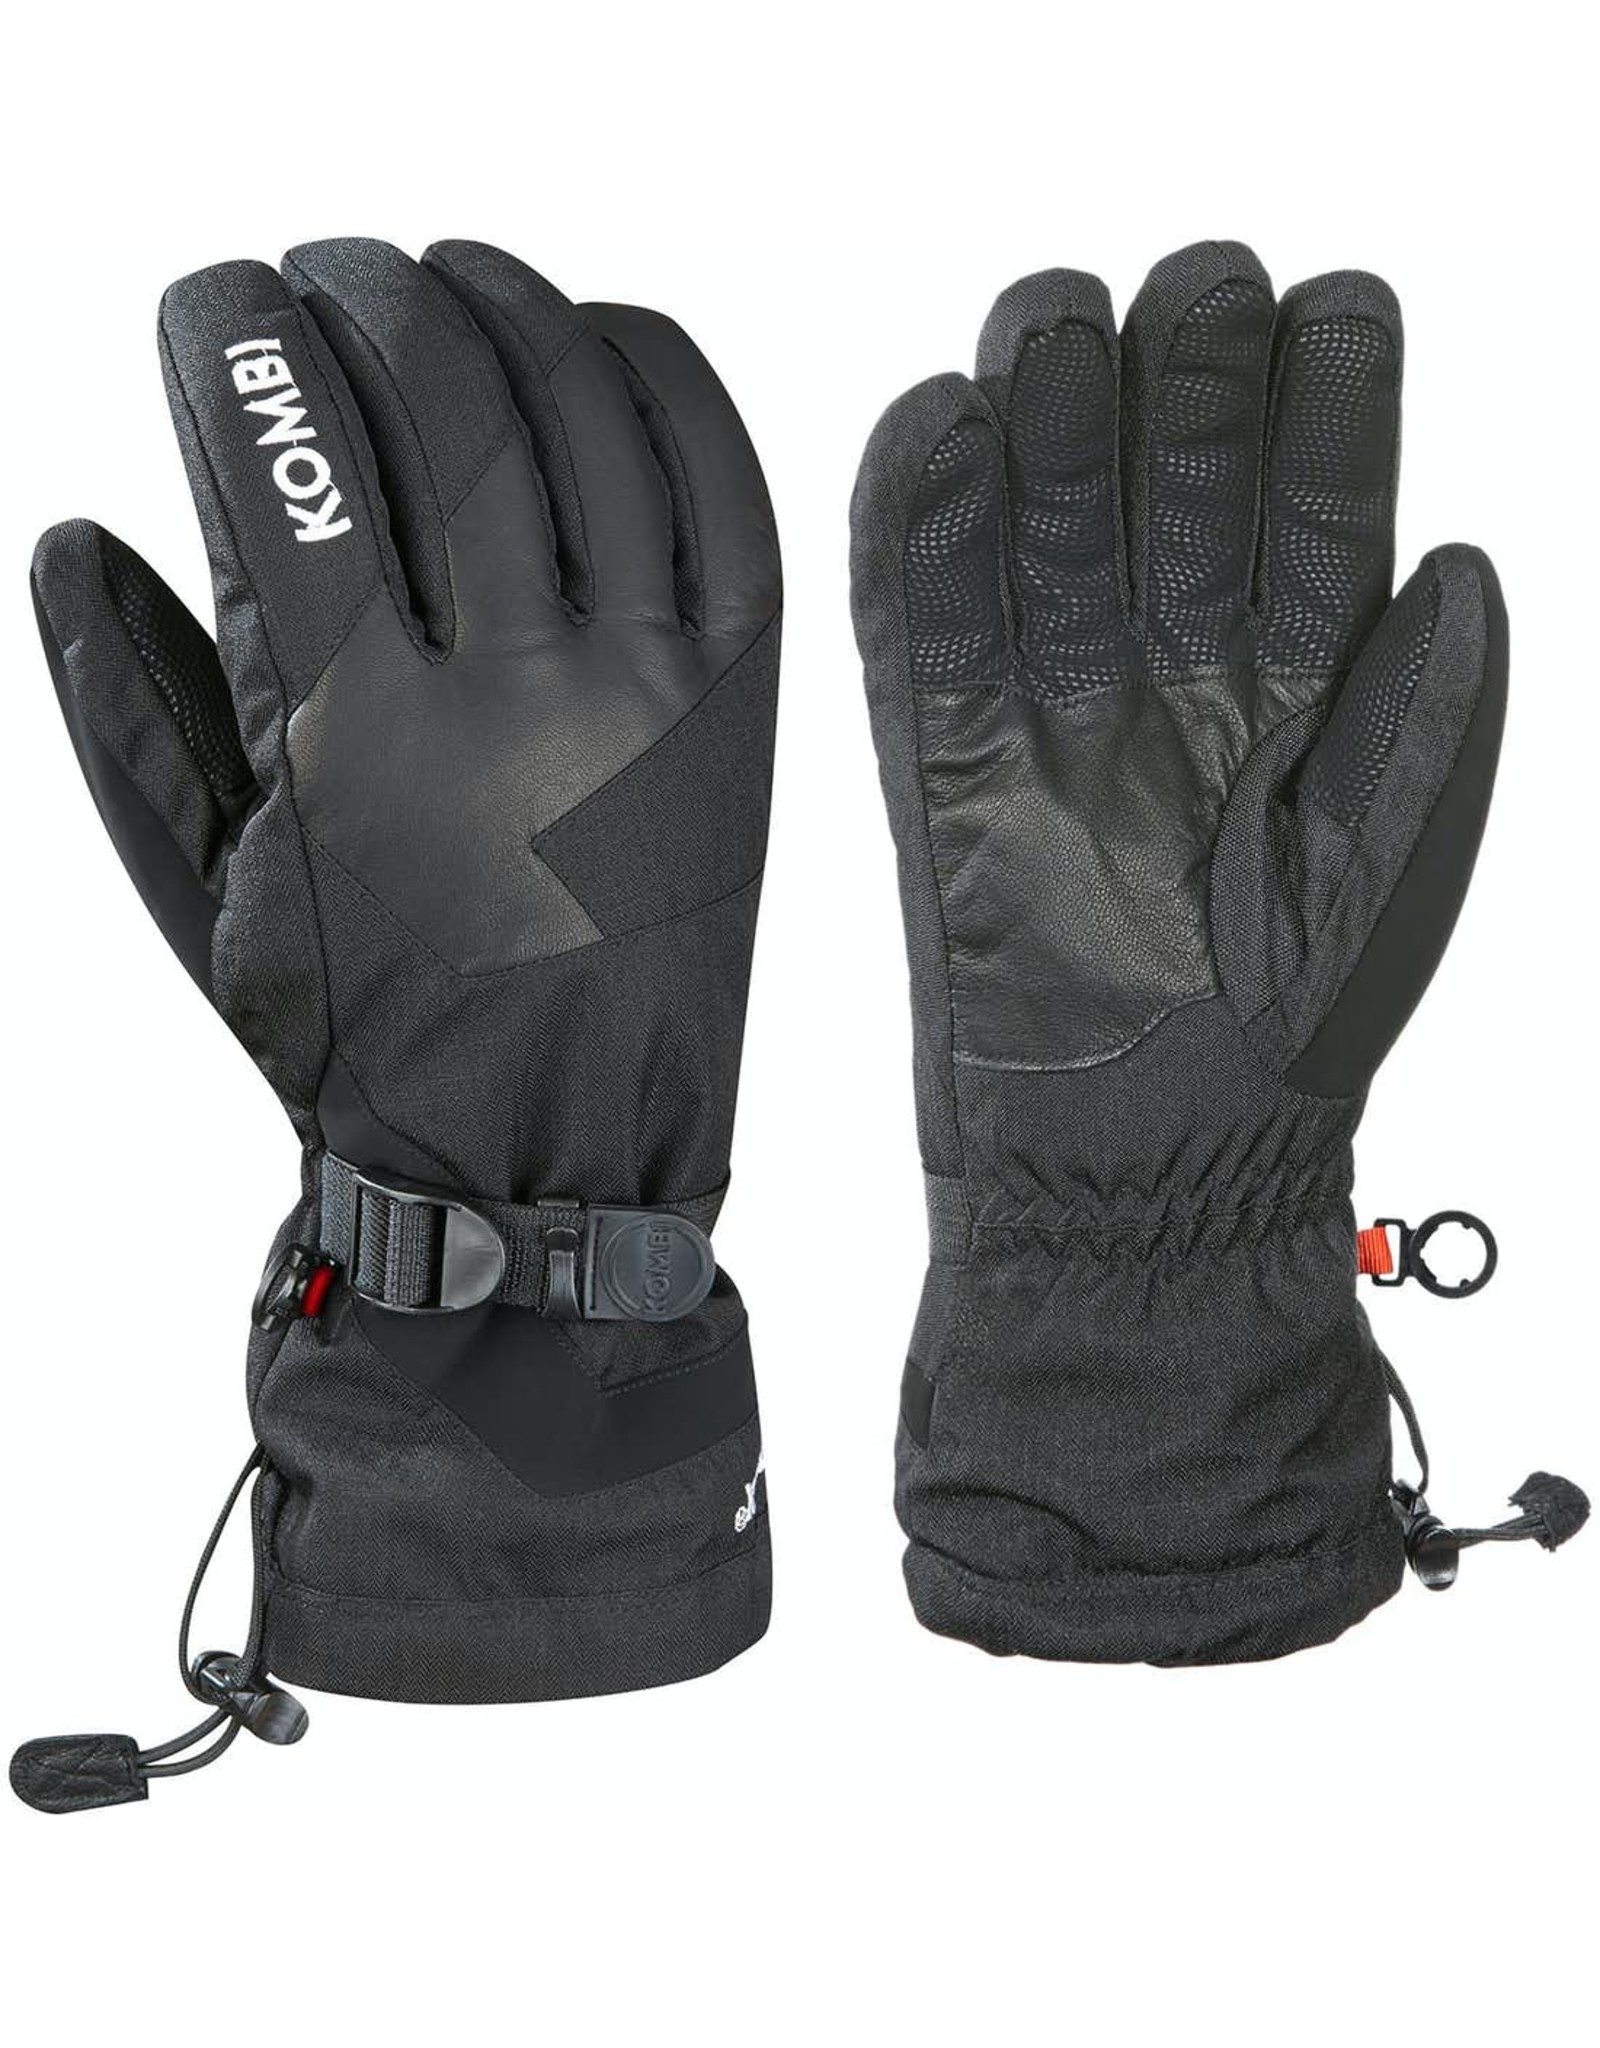 Kombi Kombi The Timeless Women's Glove